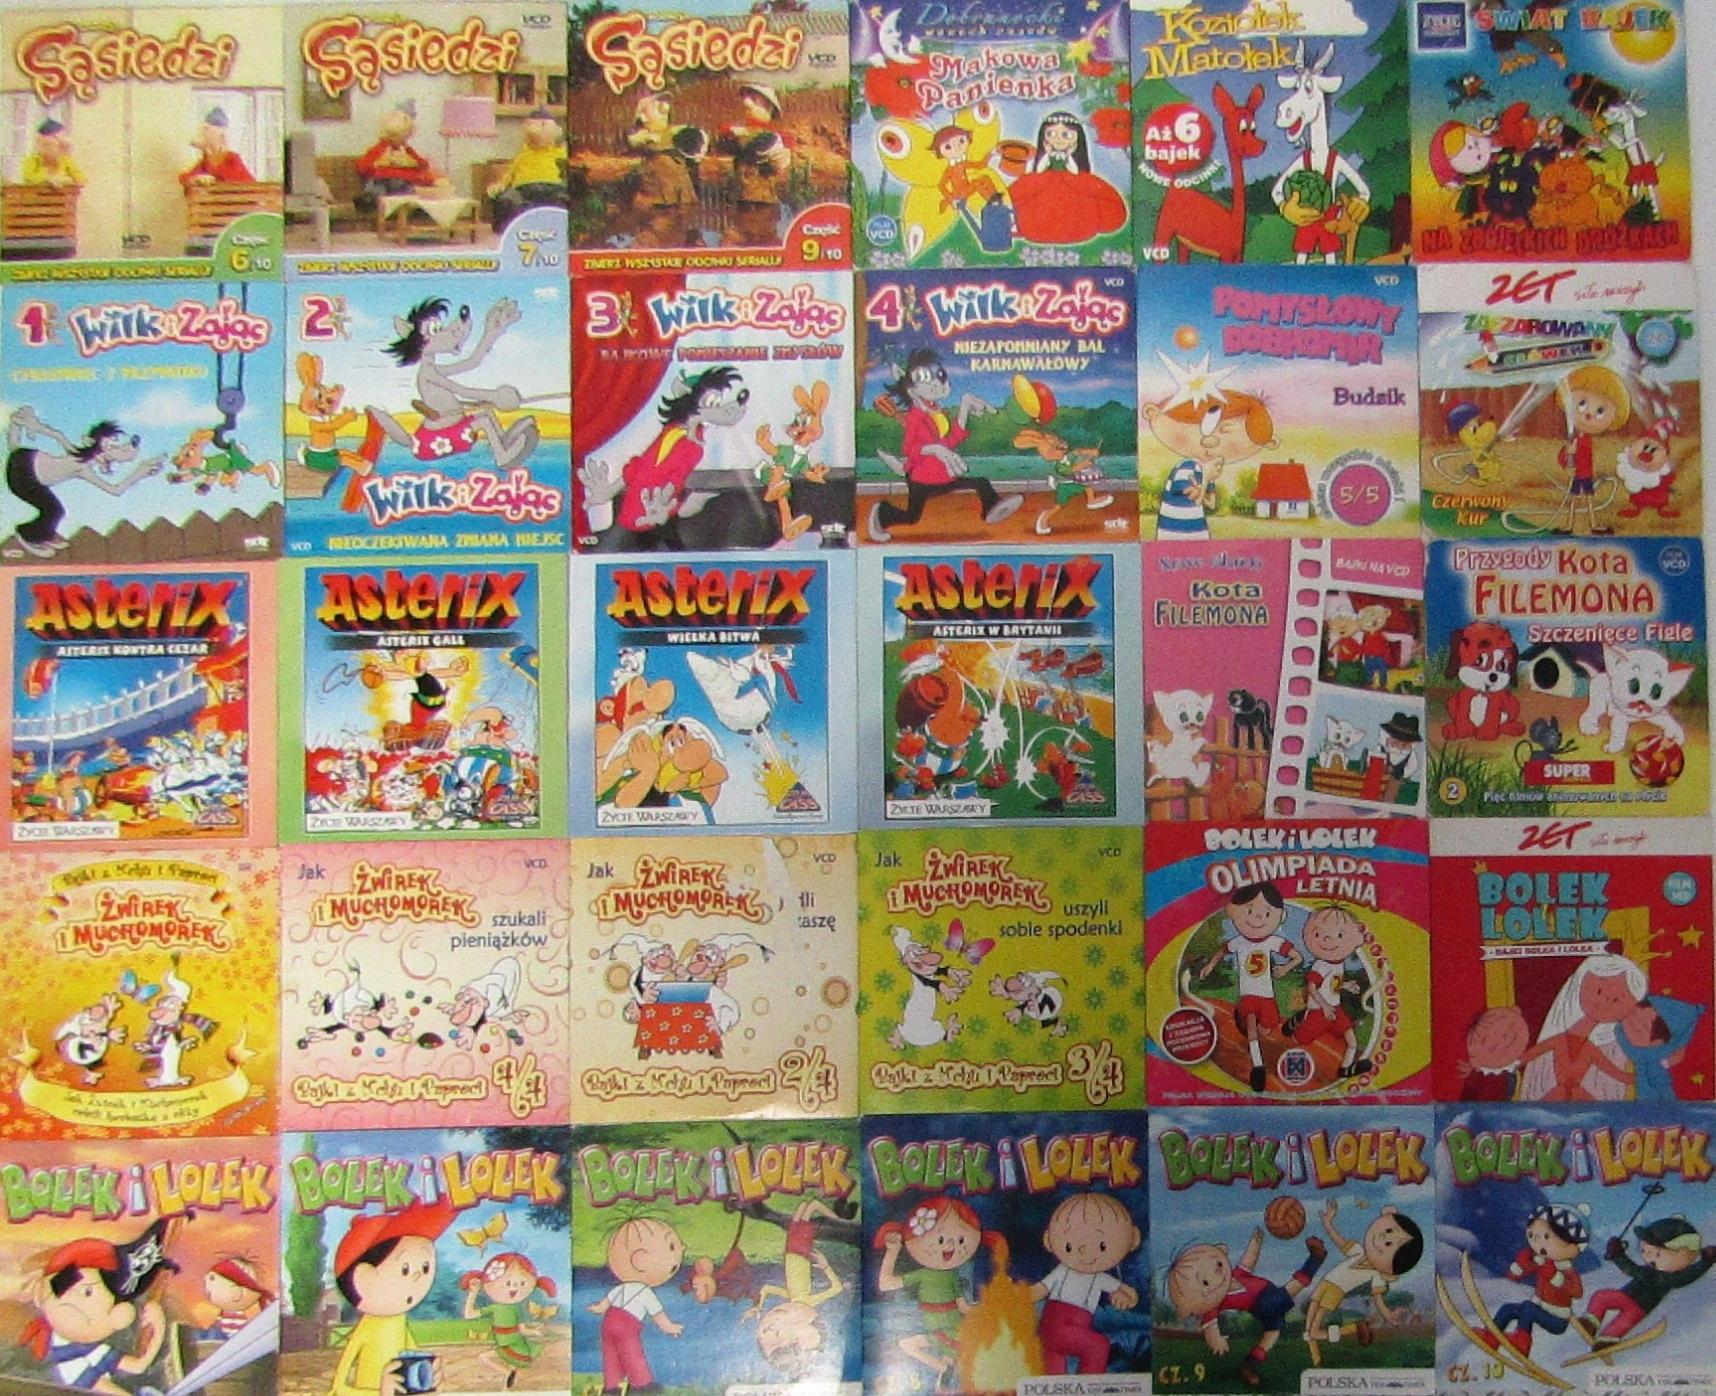 Item SET 30 DISCS VCD - CARTOONS/MOVIES FOR KIDS - EN